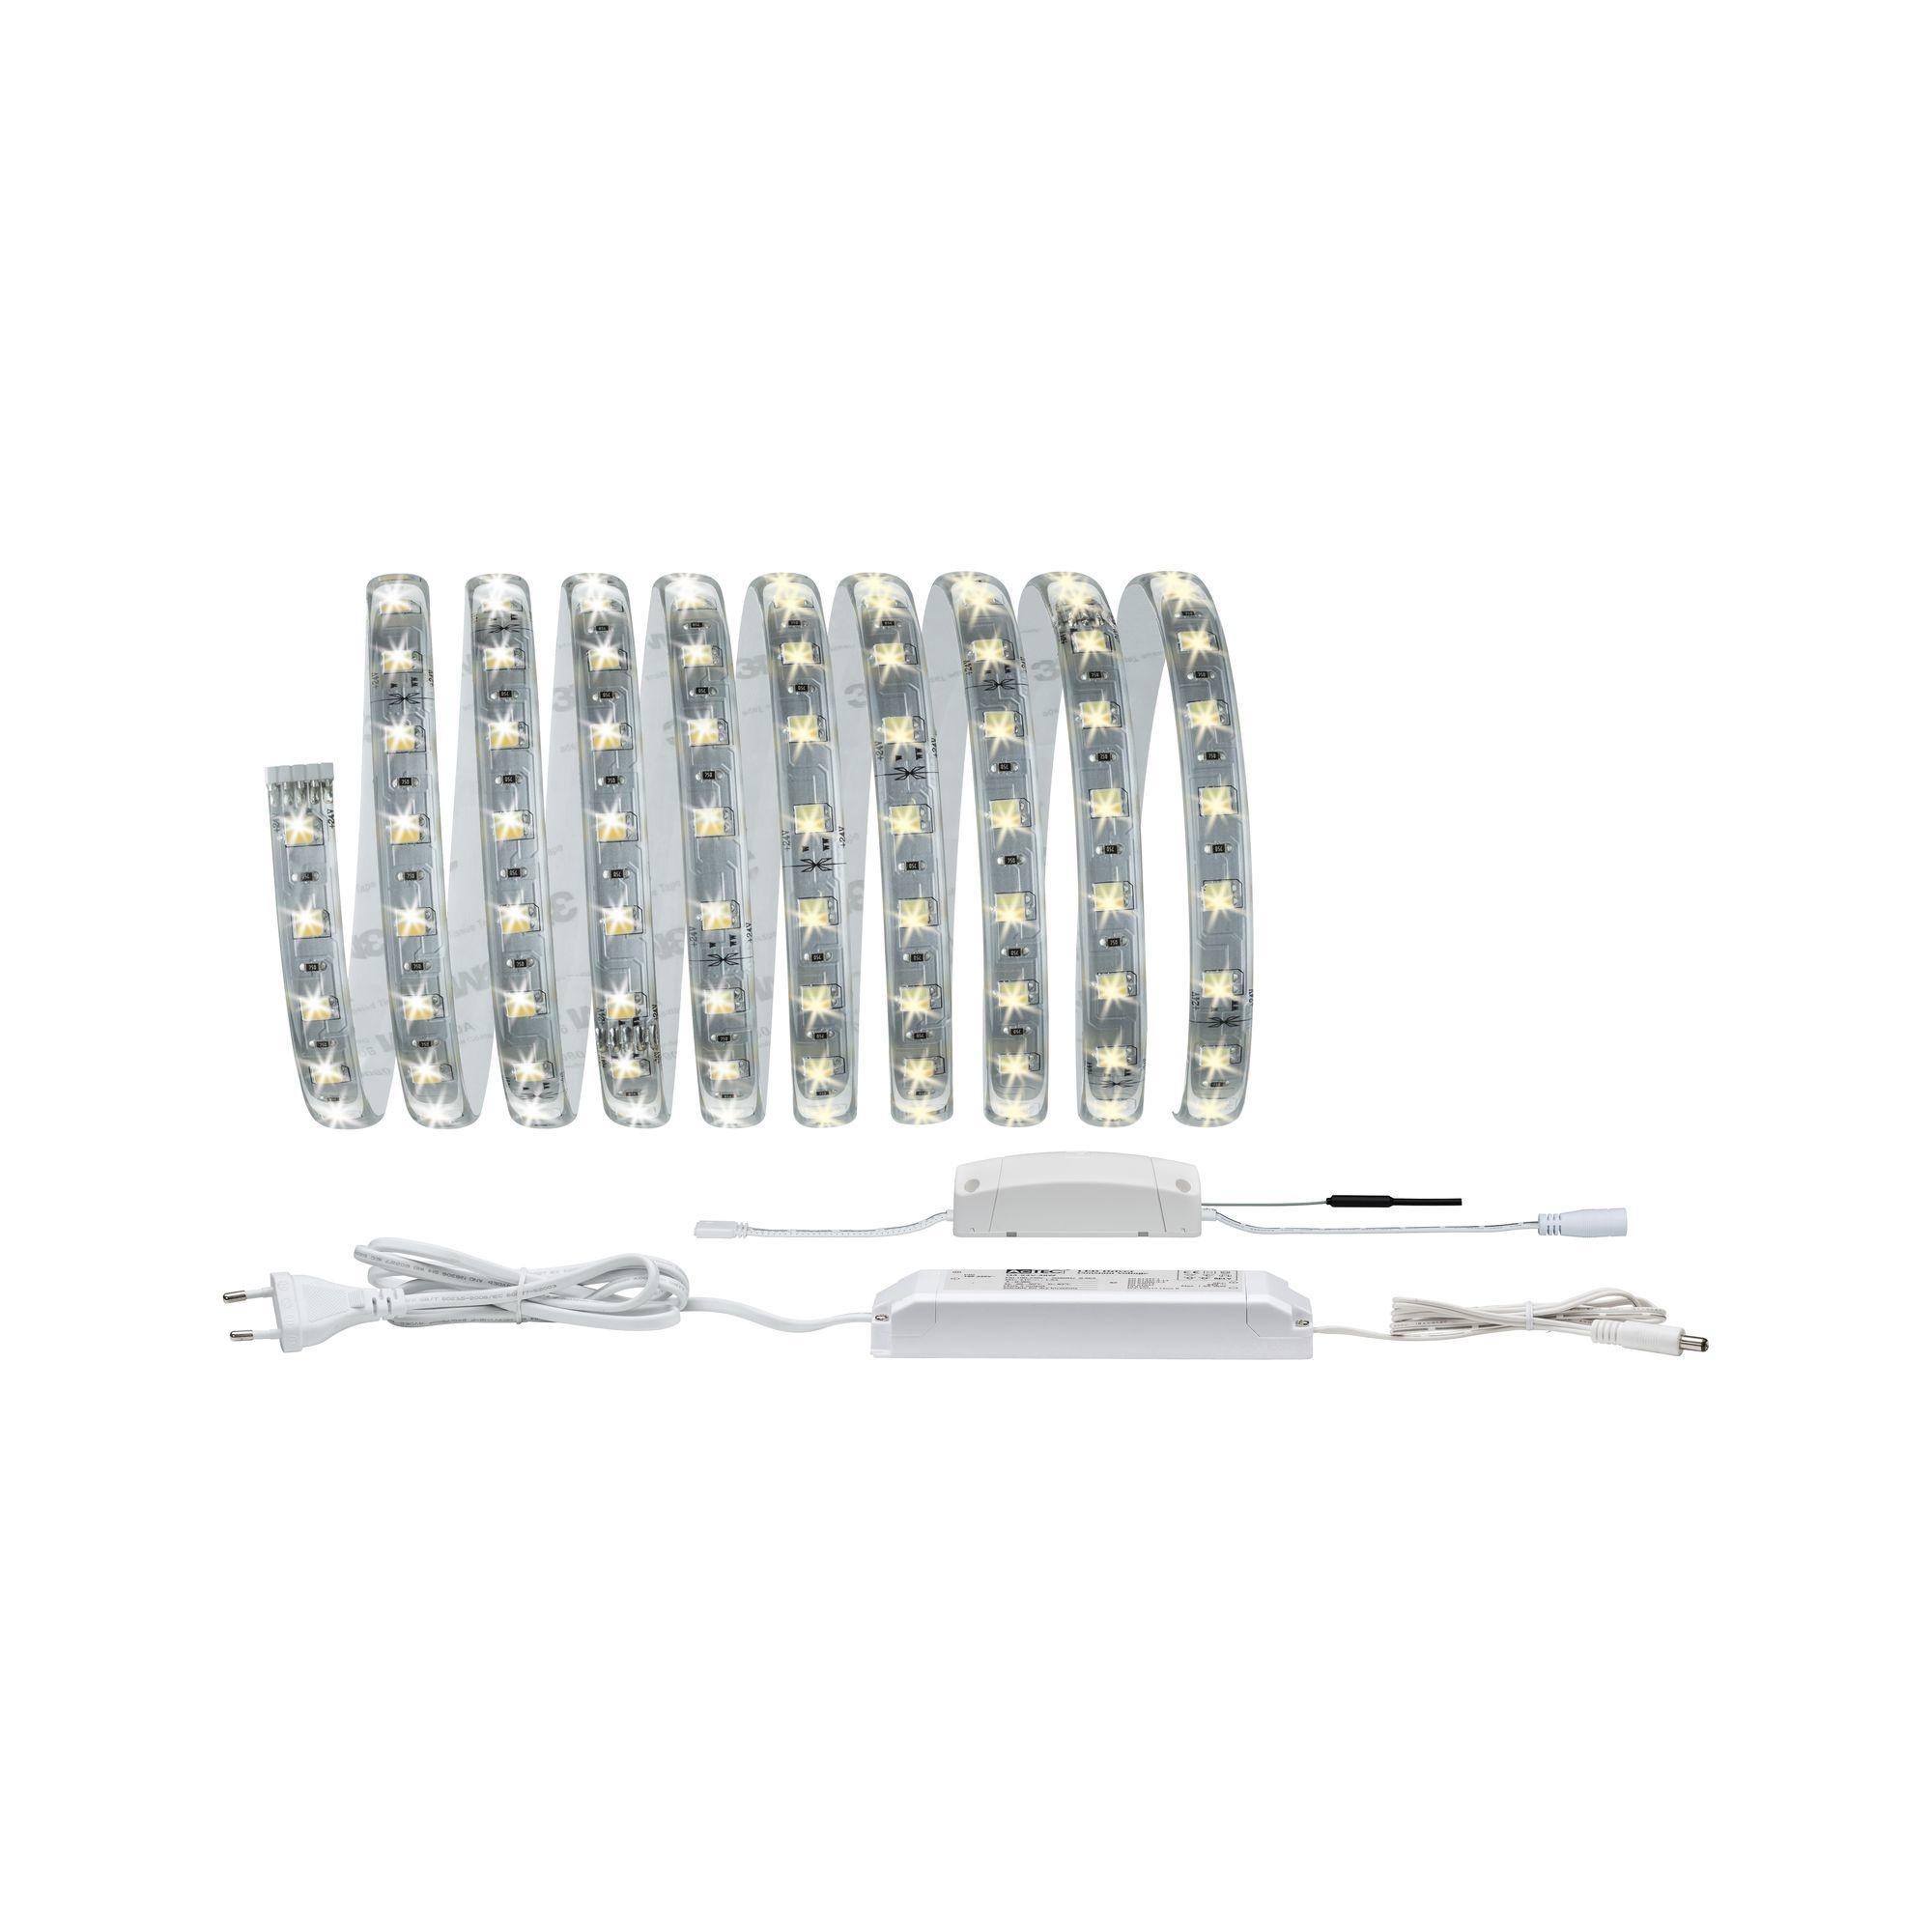 Paulmann SmartHome ZB Reflex LED Strip Set 3mTunW 20W 230/24V Weiß/Kst